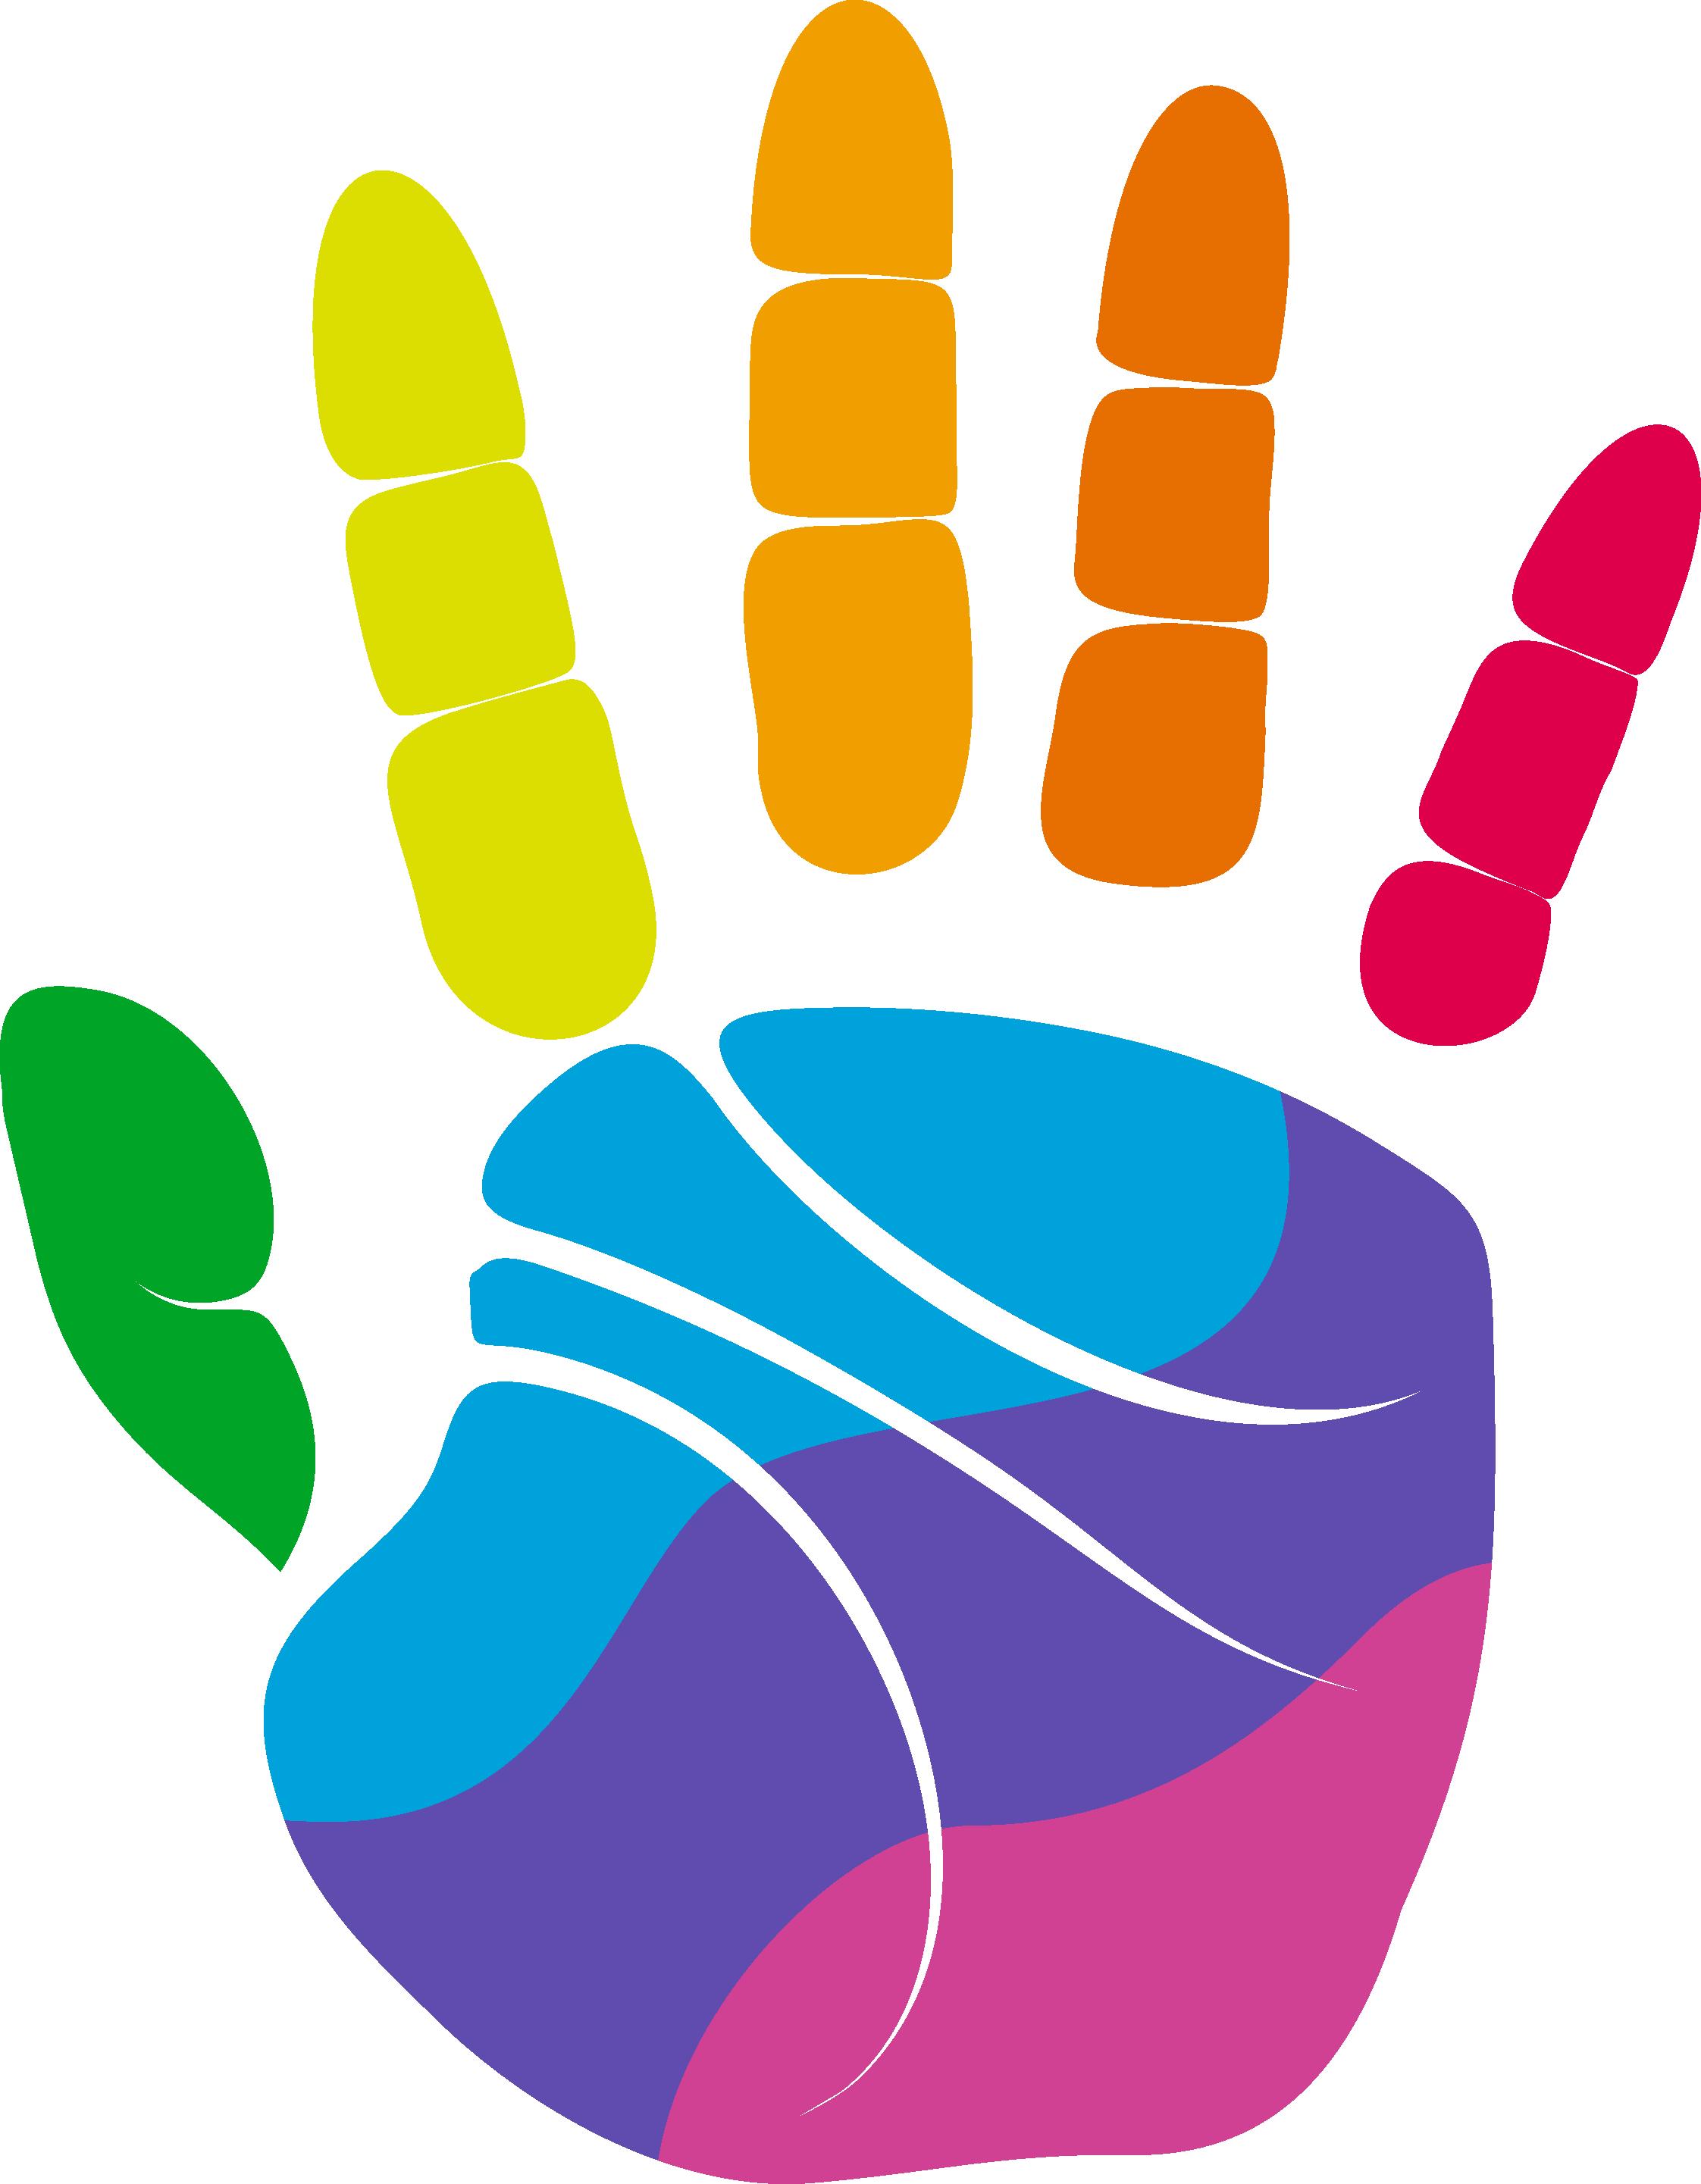 colors clipart hand palm